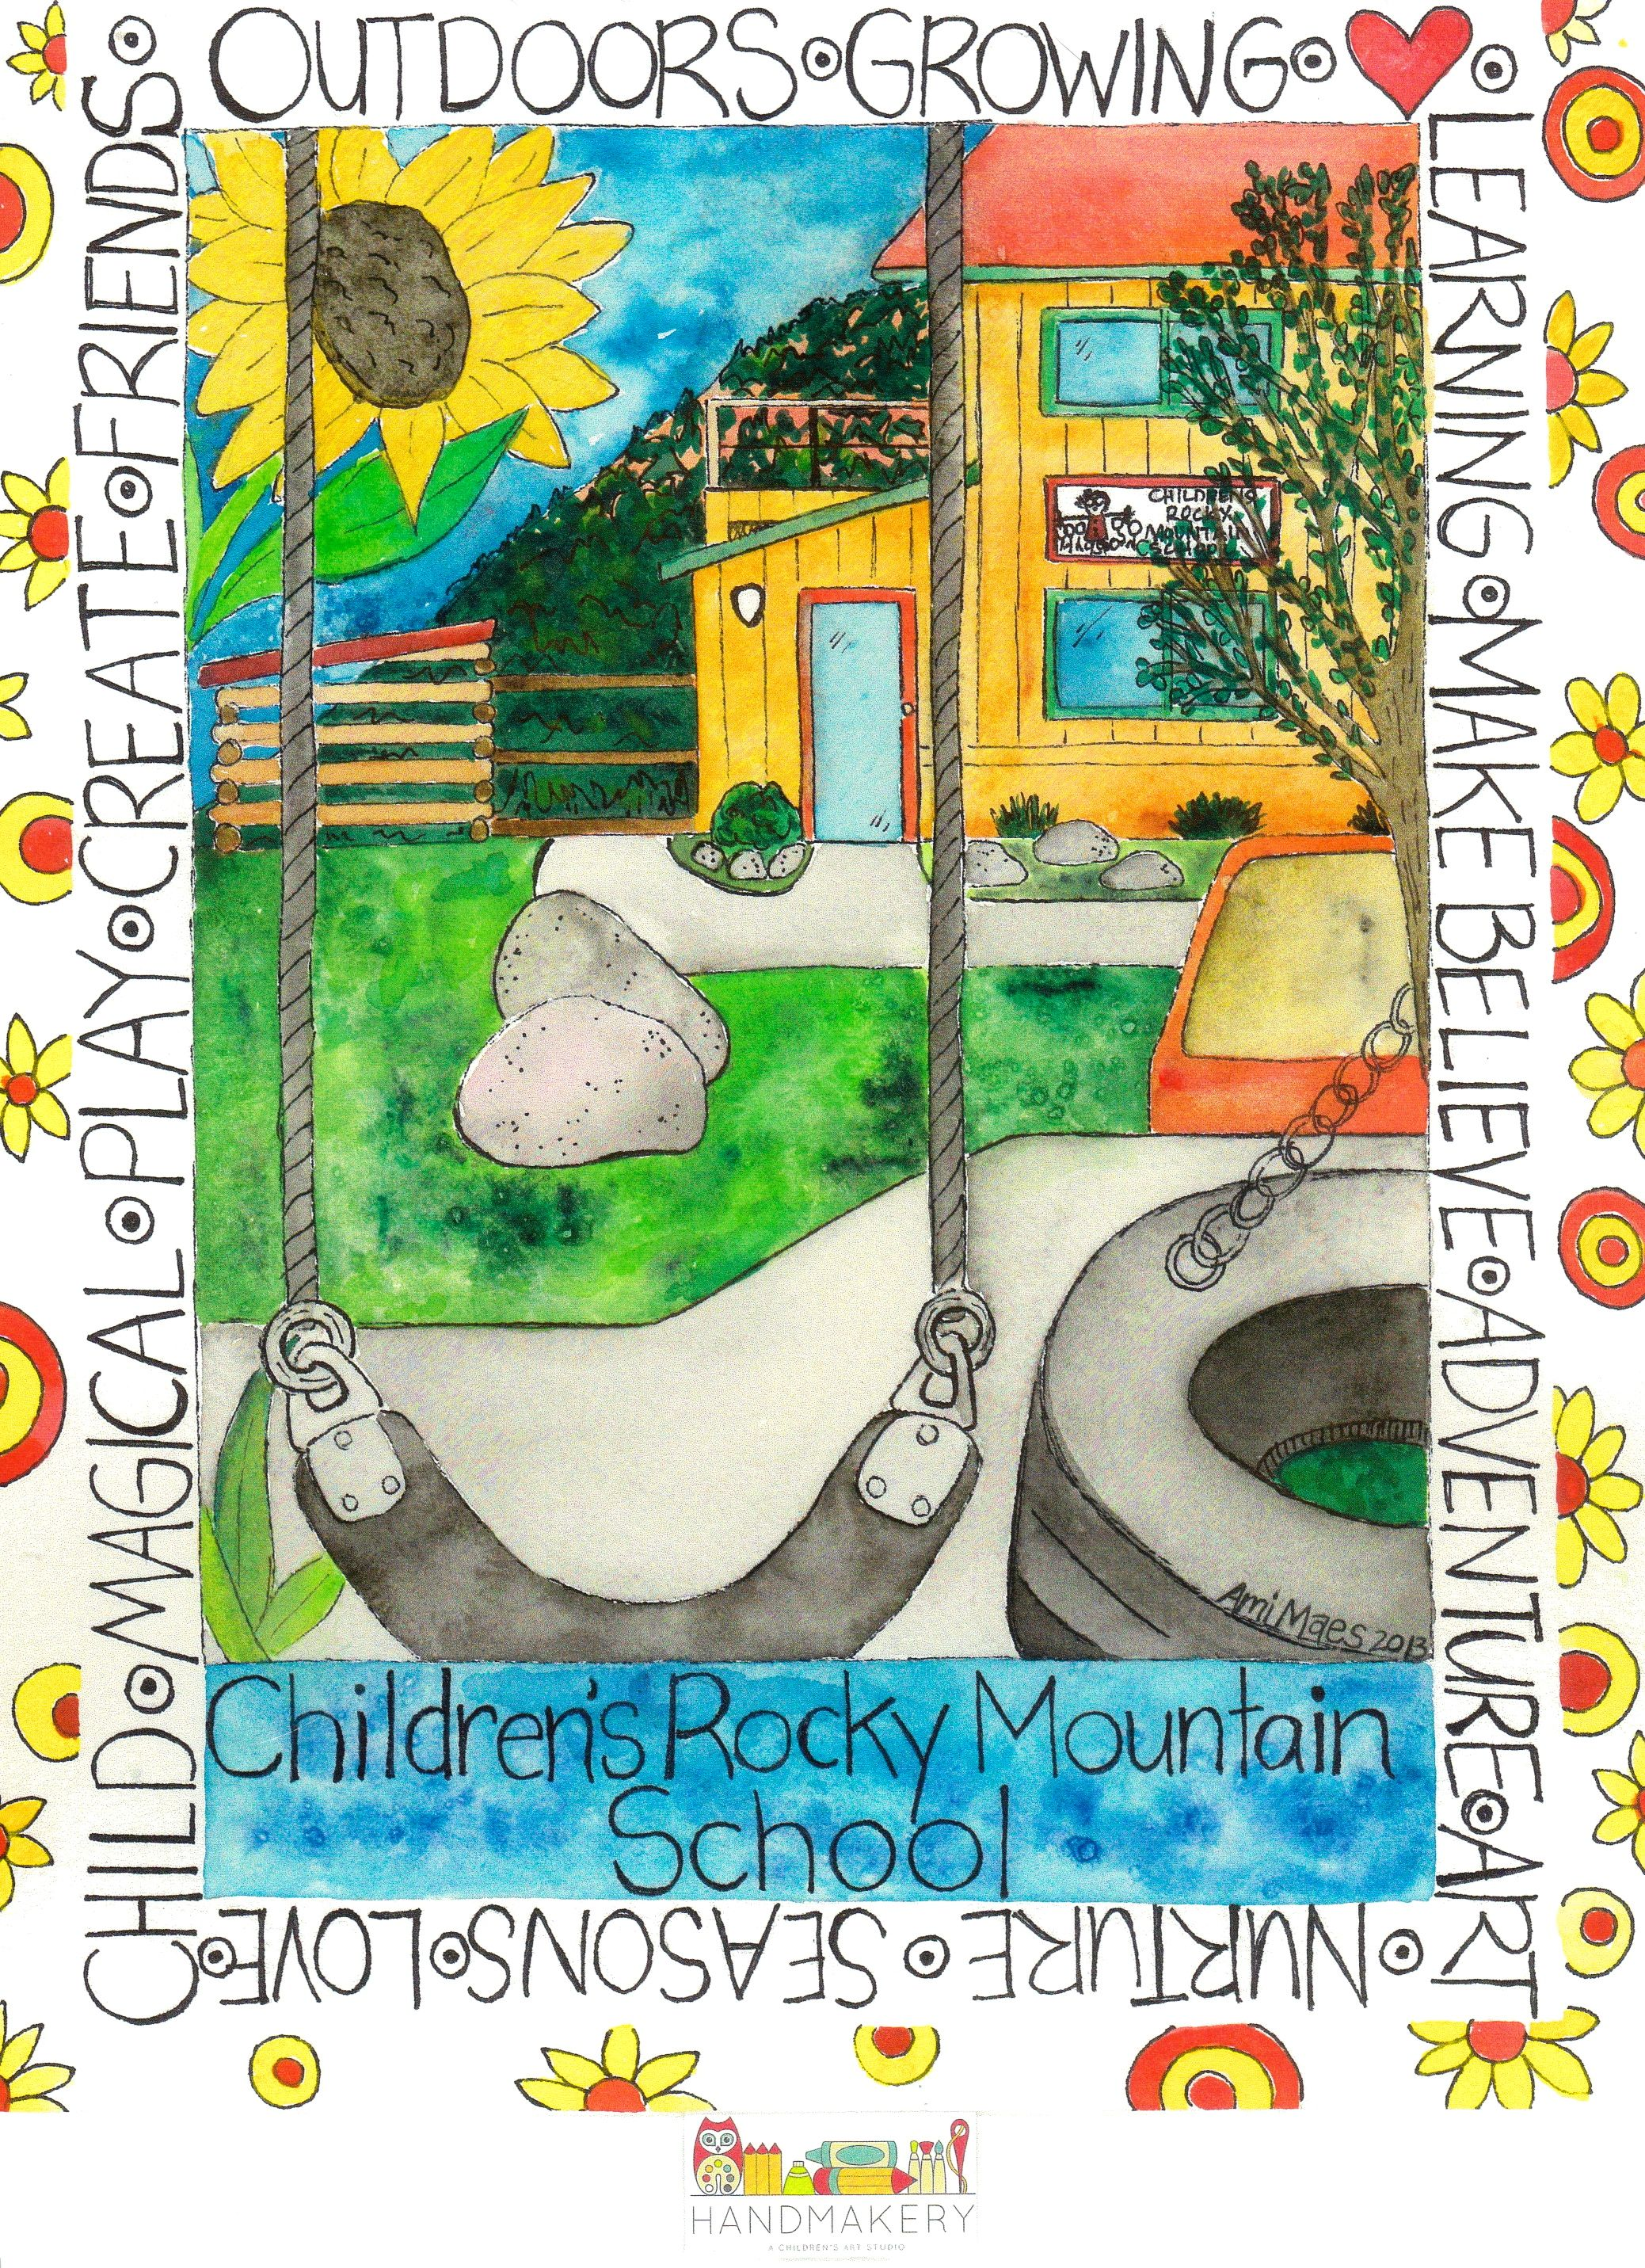 HANDMAKERY_CRMS Preschool